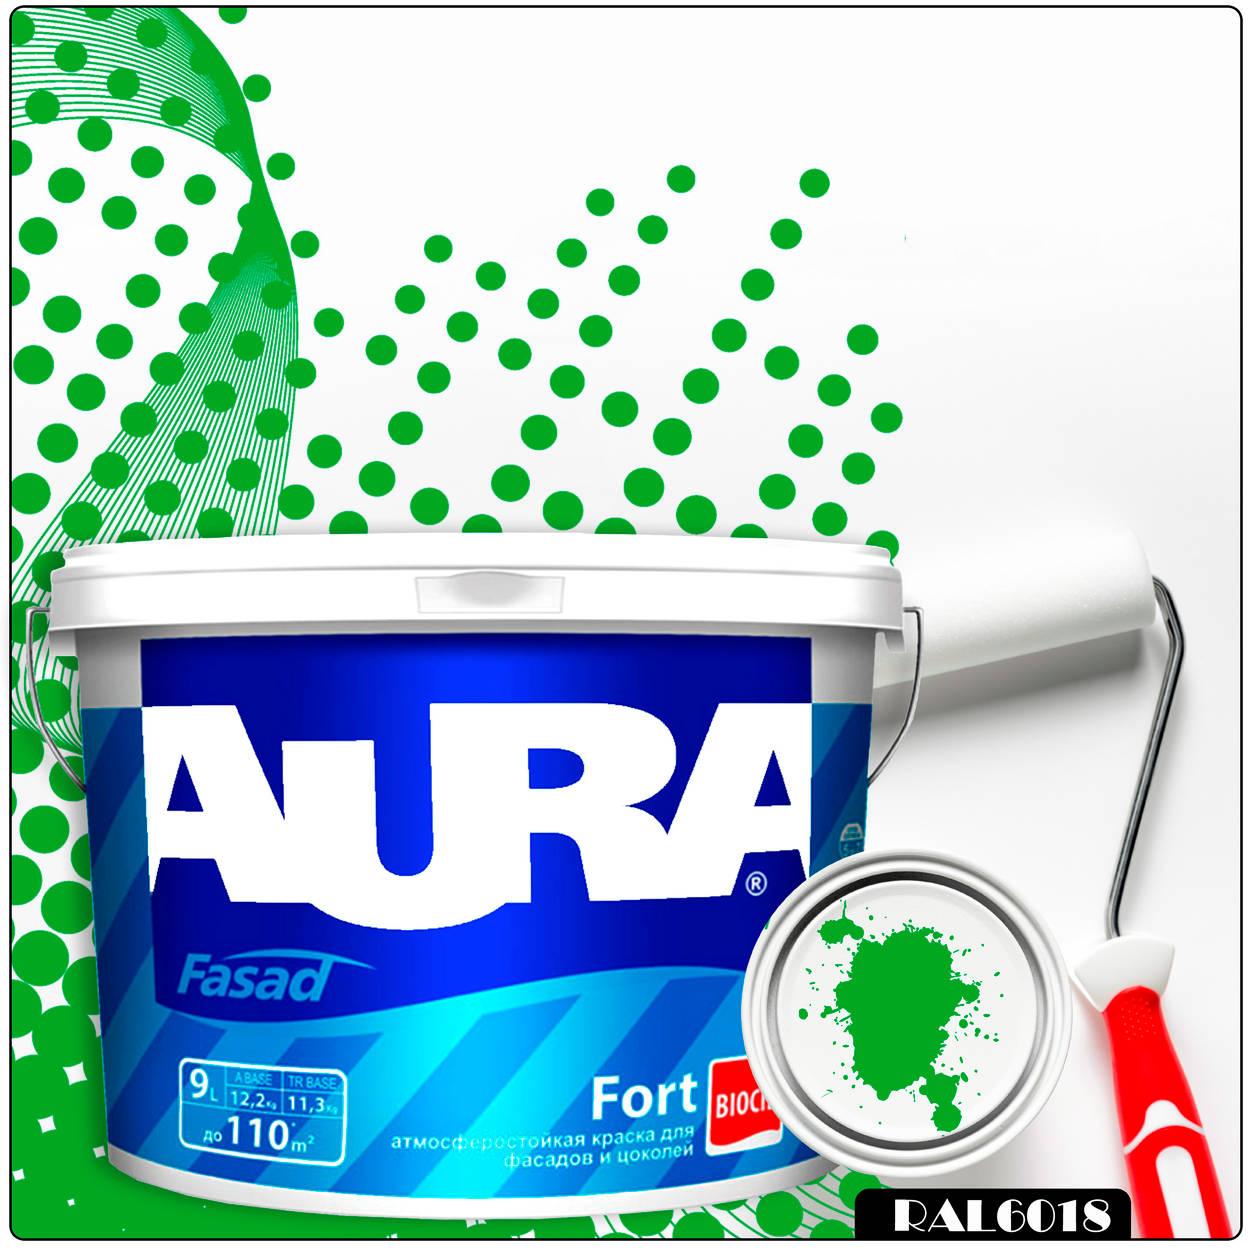 Фото 19 - Краска Aura Fasad Fort, RAL 6018 Жёлто-зелёный, латексная, матовая, для фасада и цоколей, 9л, Аура.